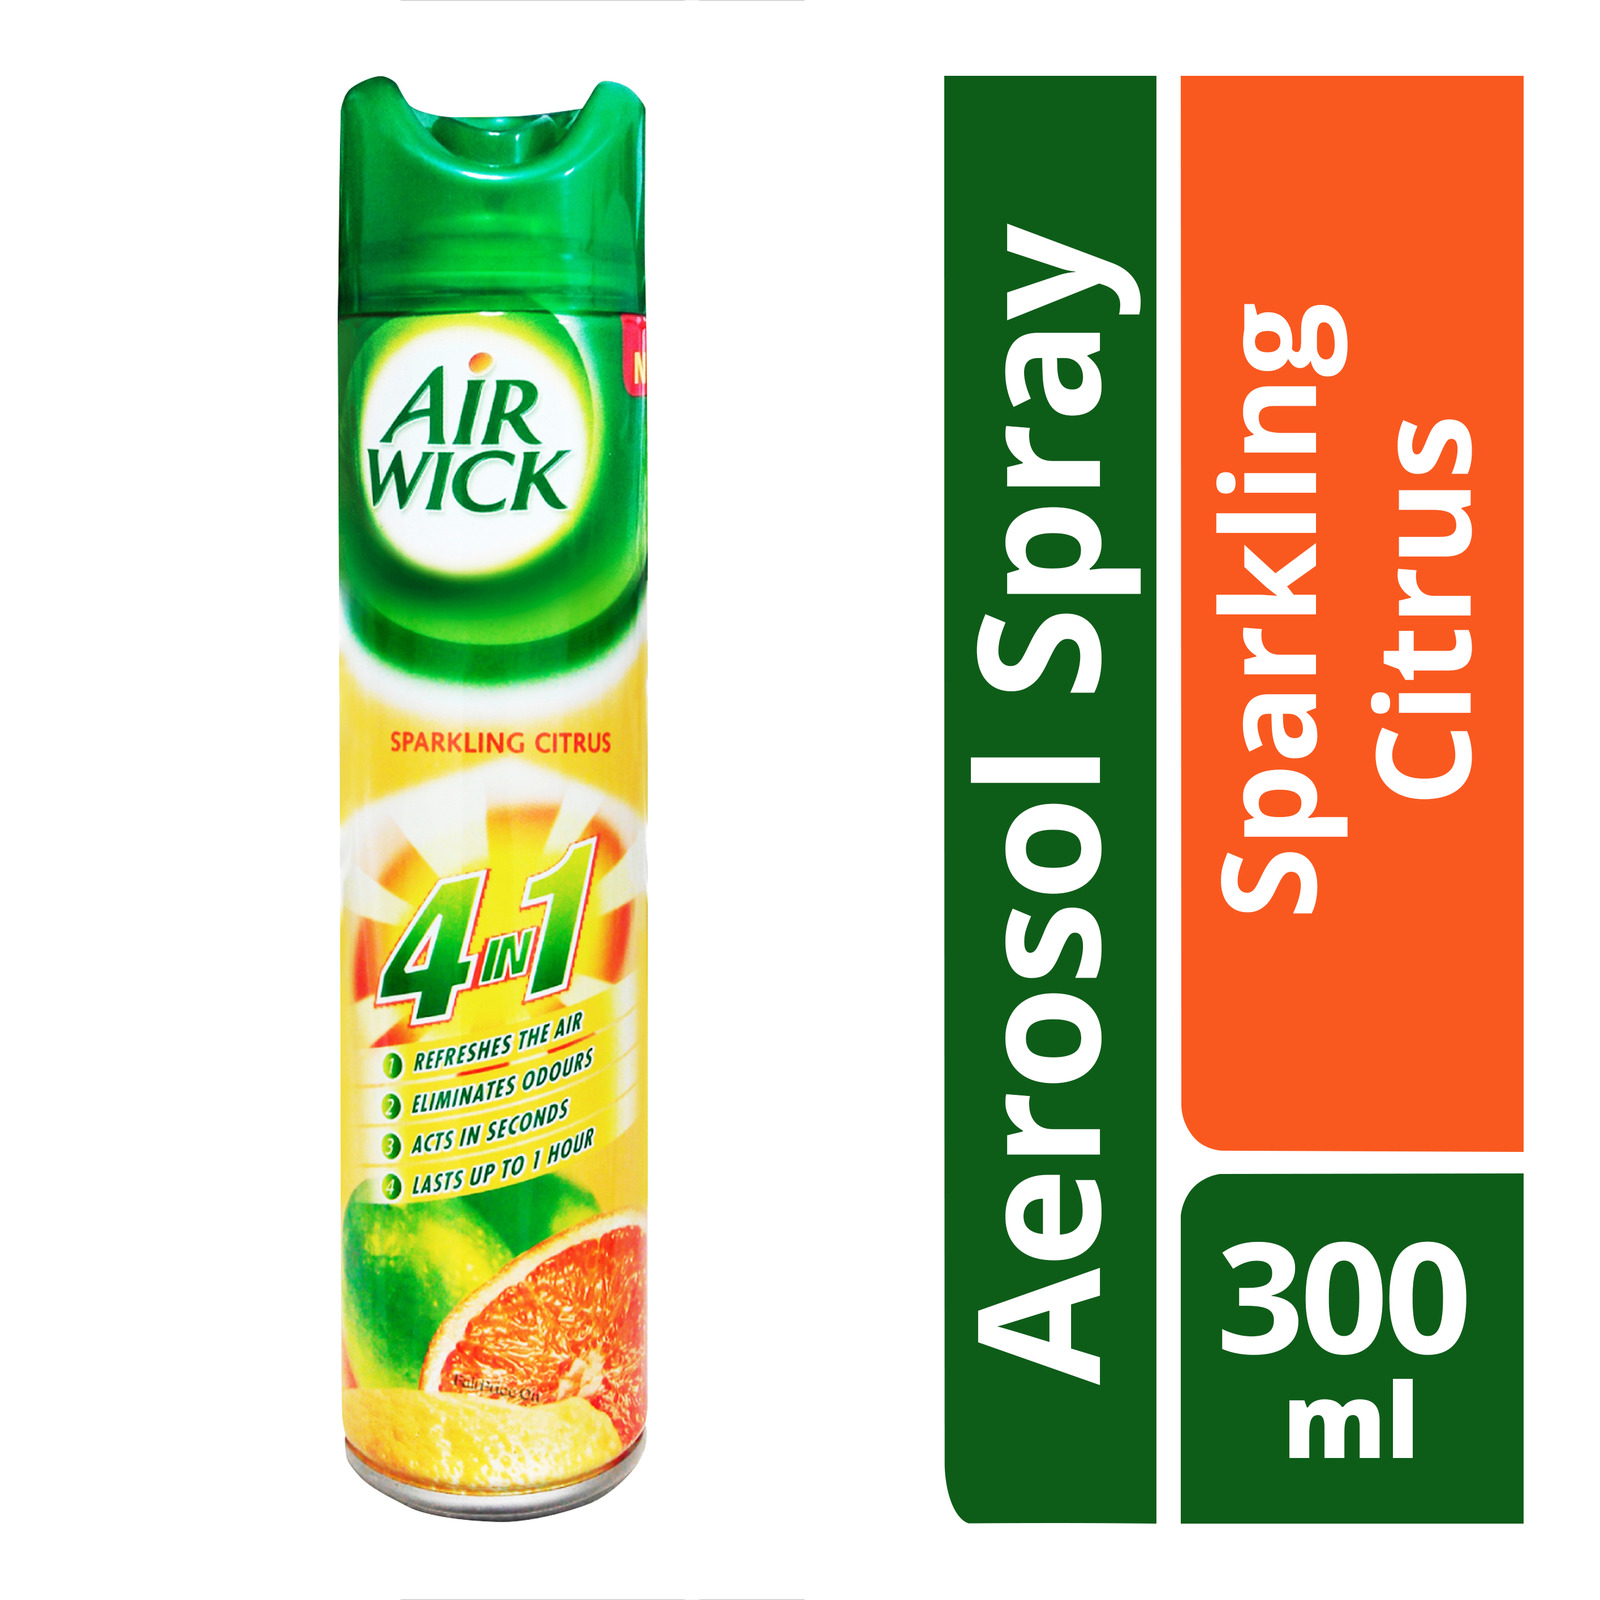 Air Wick 4 in 1 Aerosol Spray - Sparkling Citrus